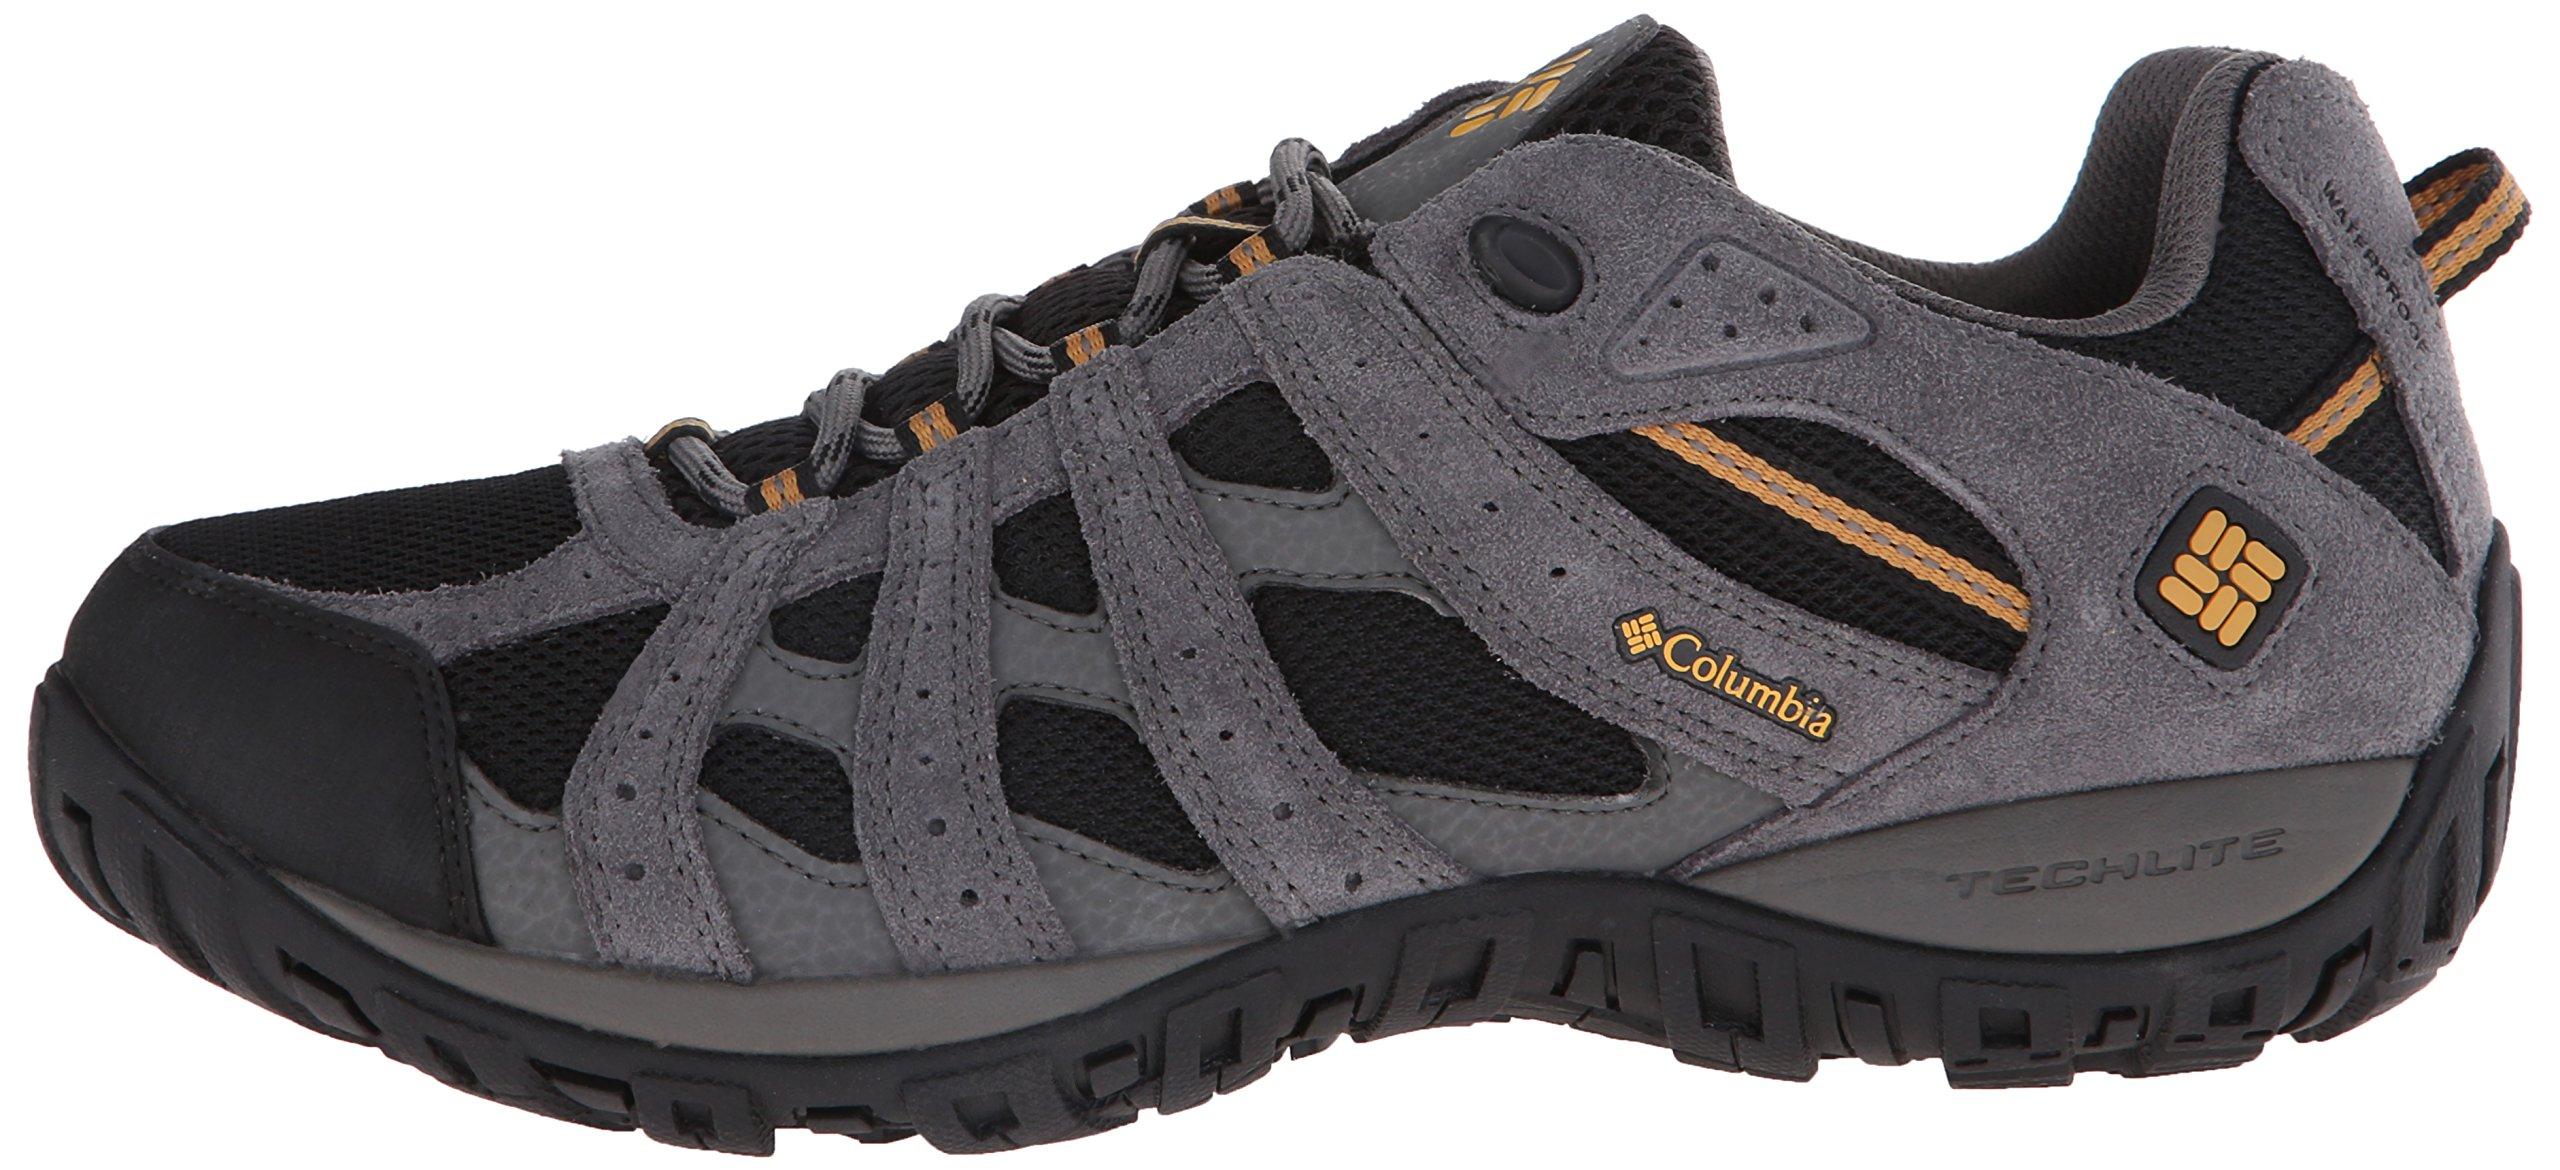 Columbia Men's Redmond Waterproof Hiking Shoe Black, Squash 7.5 D US by Columbia (Image #5)